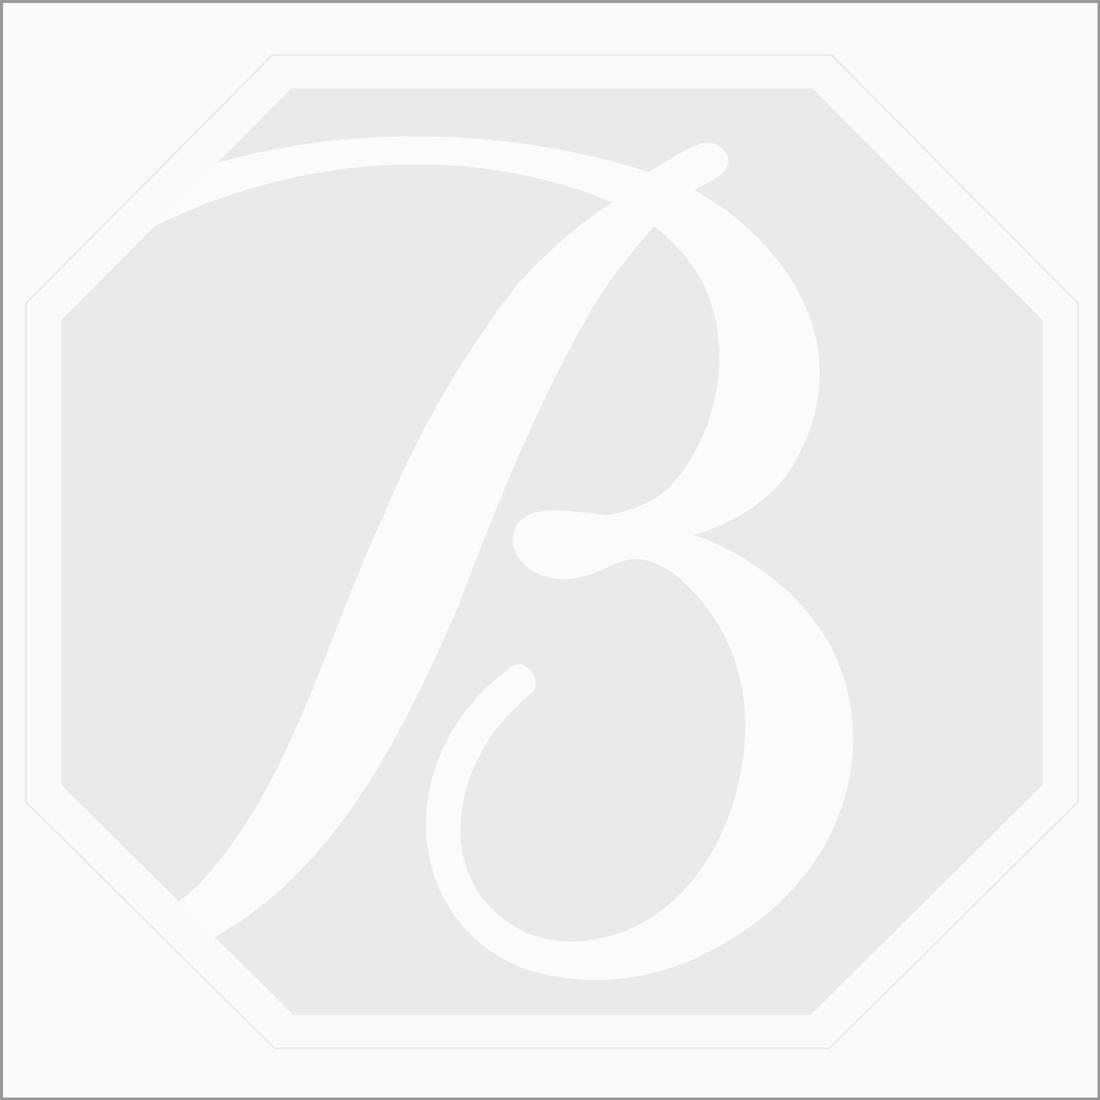 25 x 20 mm - Watermelon (Bi-Color) Tourmaline Carving - 29.50 carats (ToCarv1018)